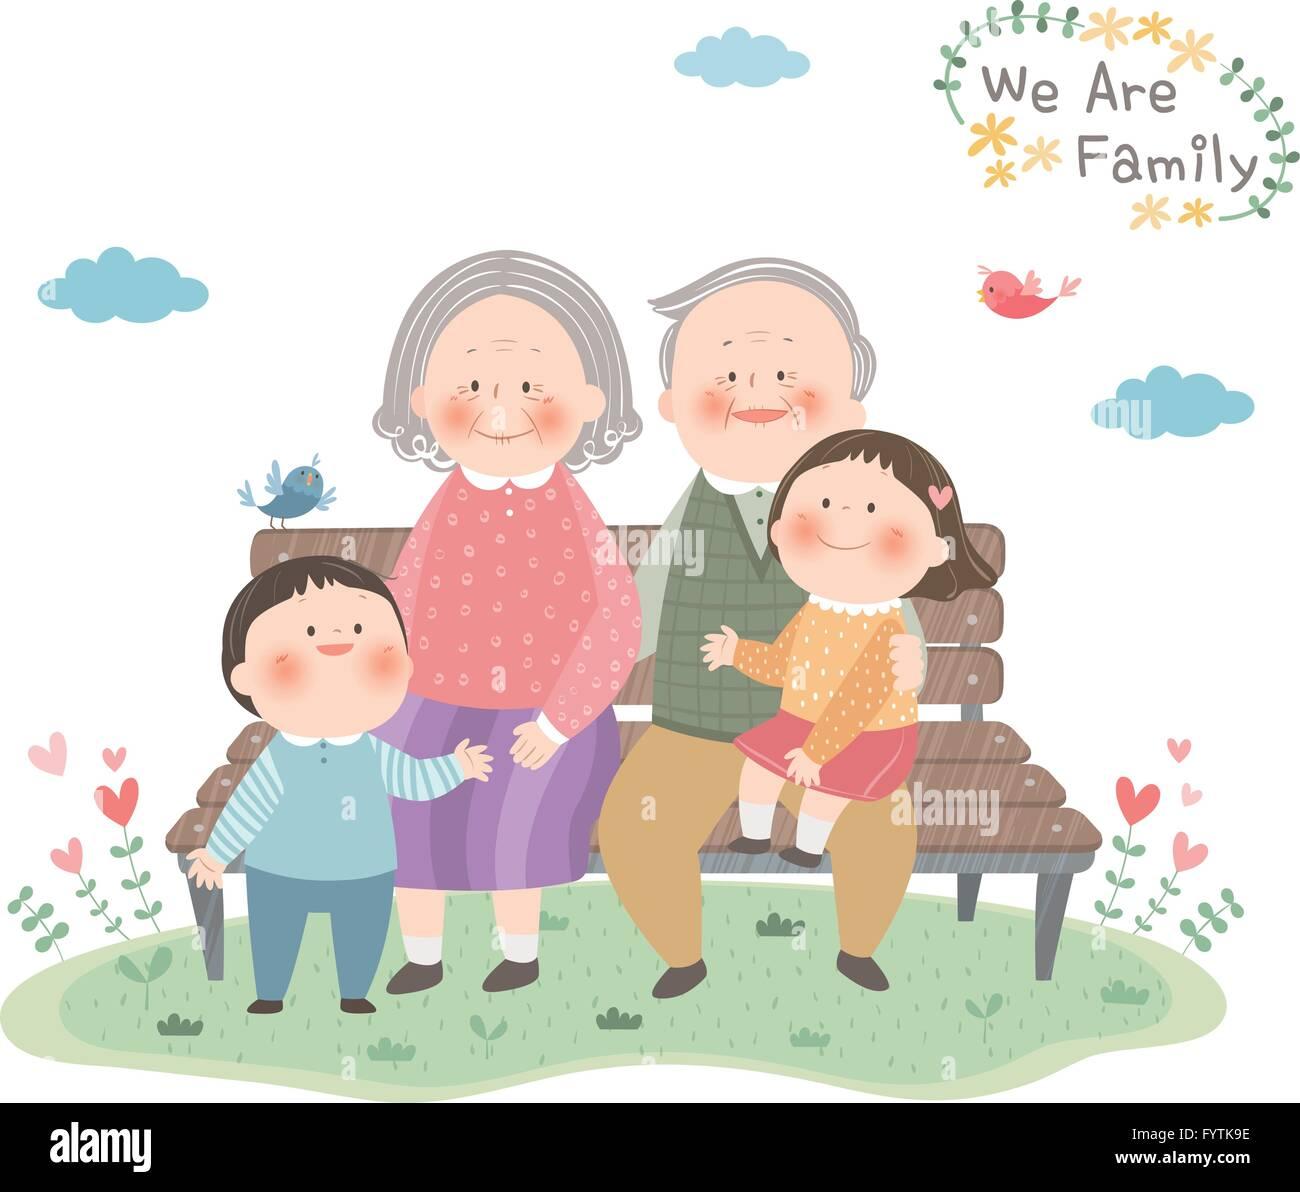 Family members 009 - Stock Image